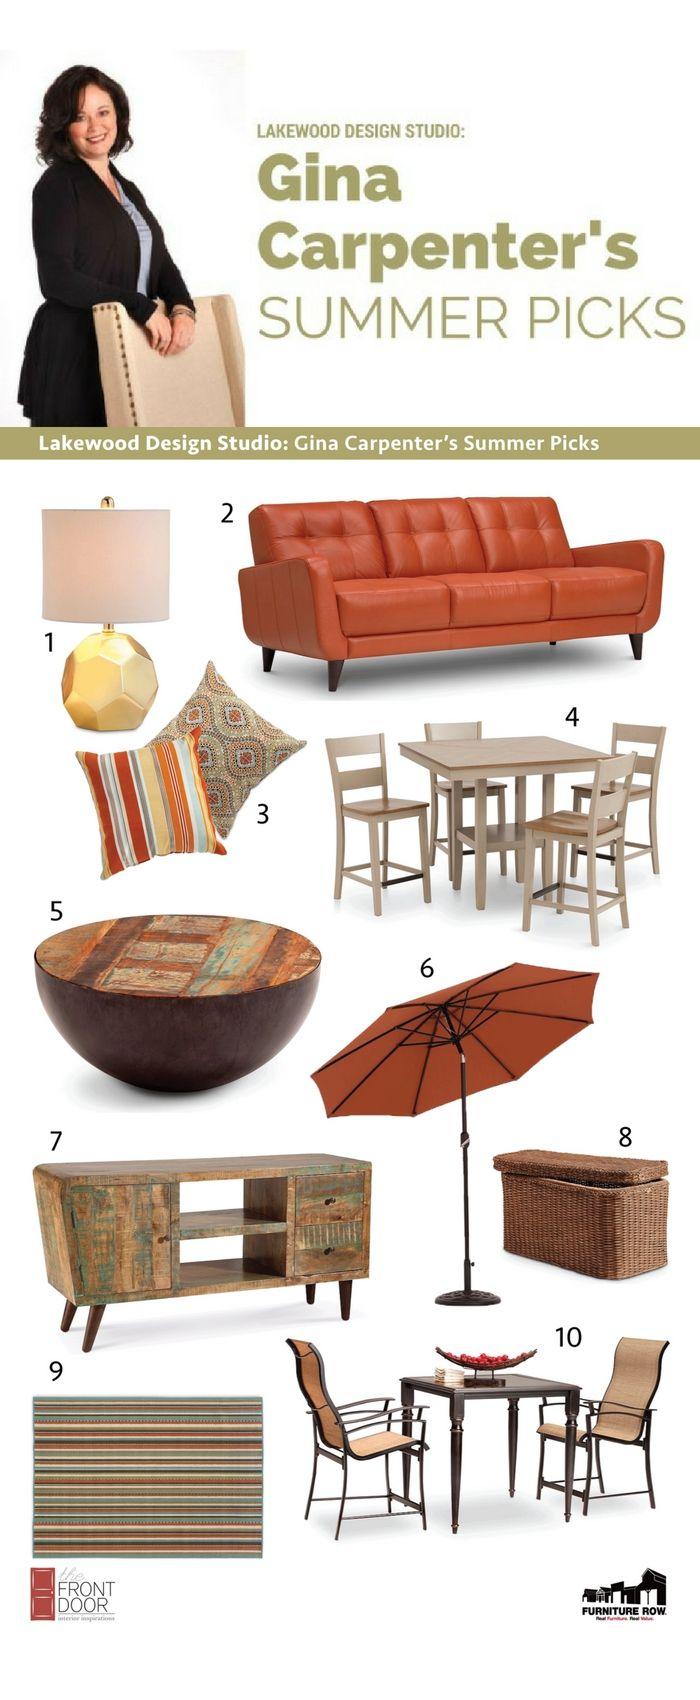 Lakewood Design Studio Gina Carpenter's Summer Picks